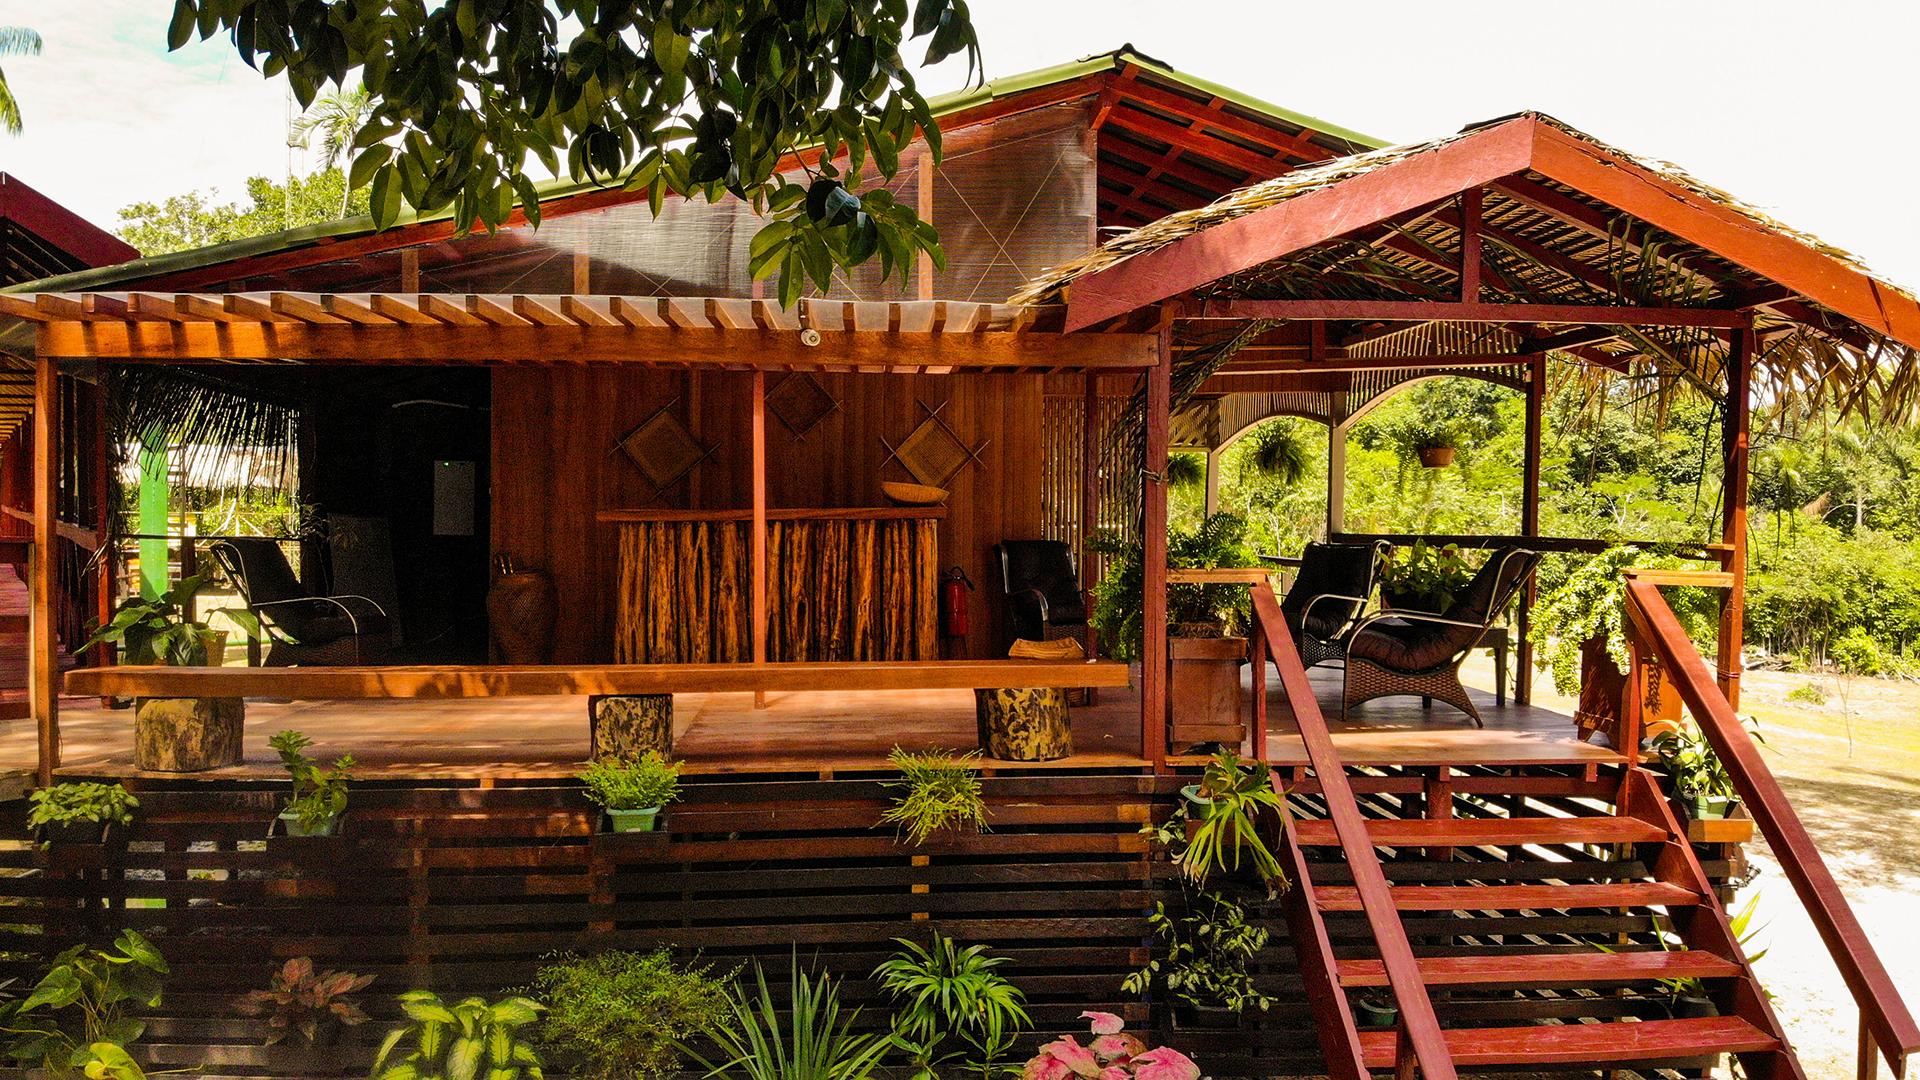 hotel de selva manati lodge de alma cabocla